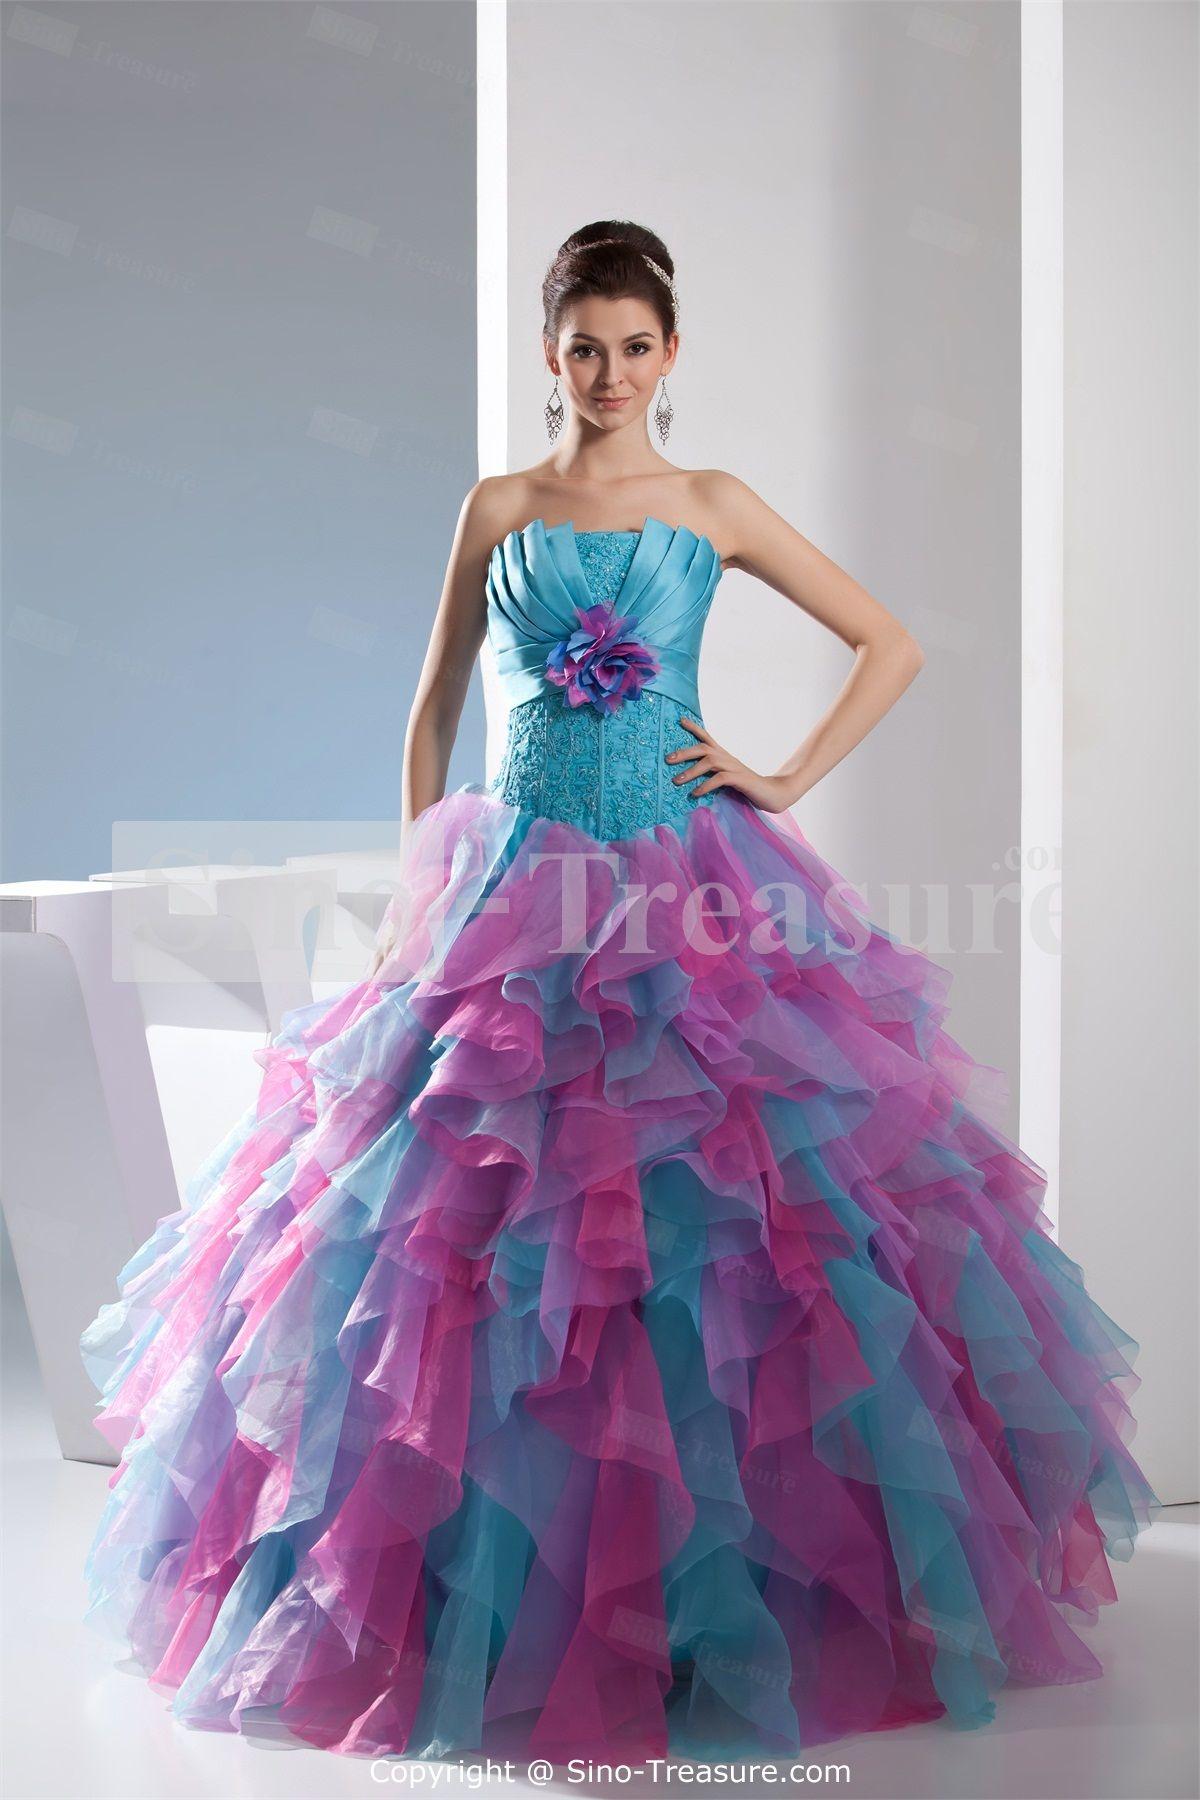 c2b4481b0e164d Beading Strapless Apple Handmade Flower Sleeveless A-Line Prom Dress  Wholesale Price  US 287.99